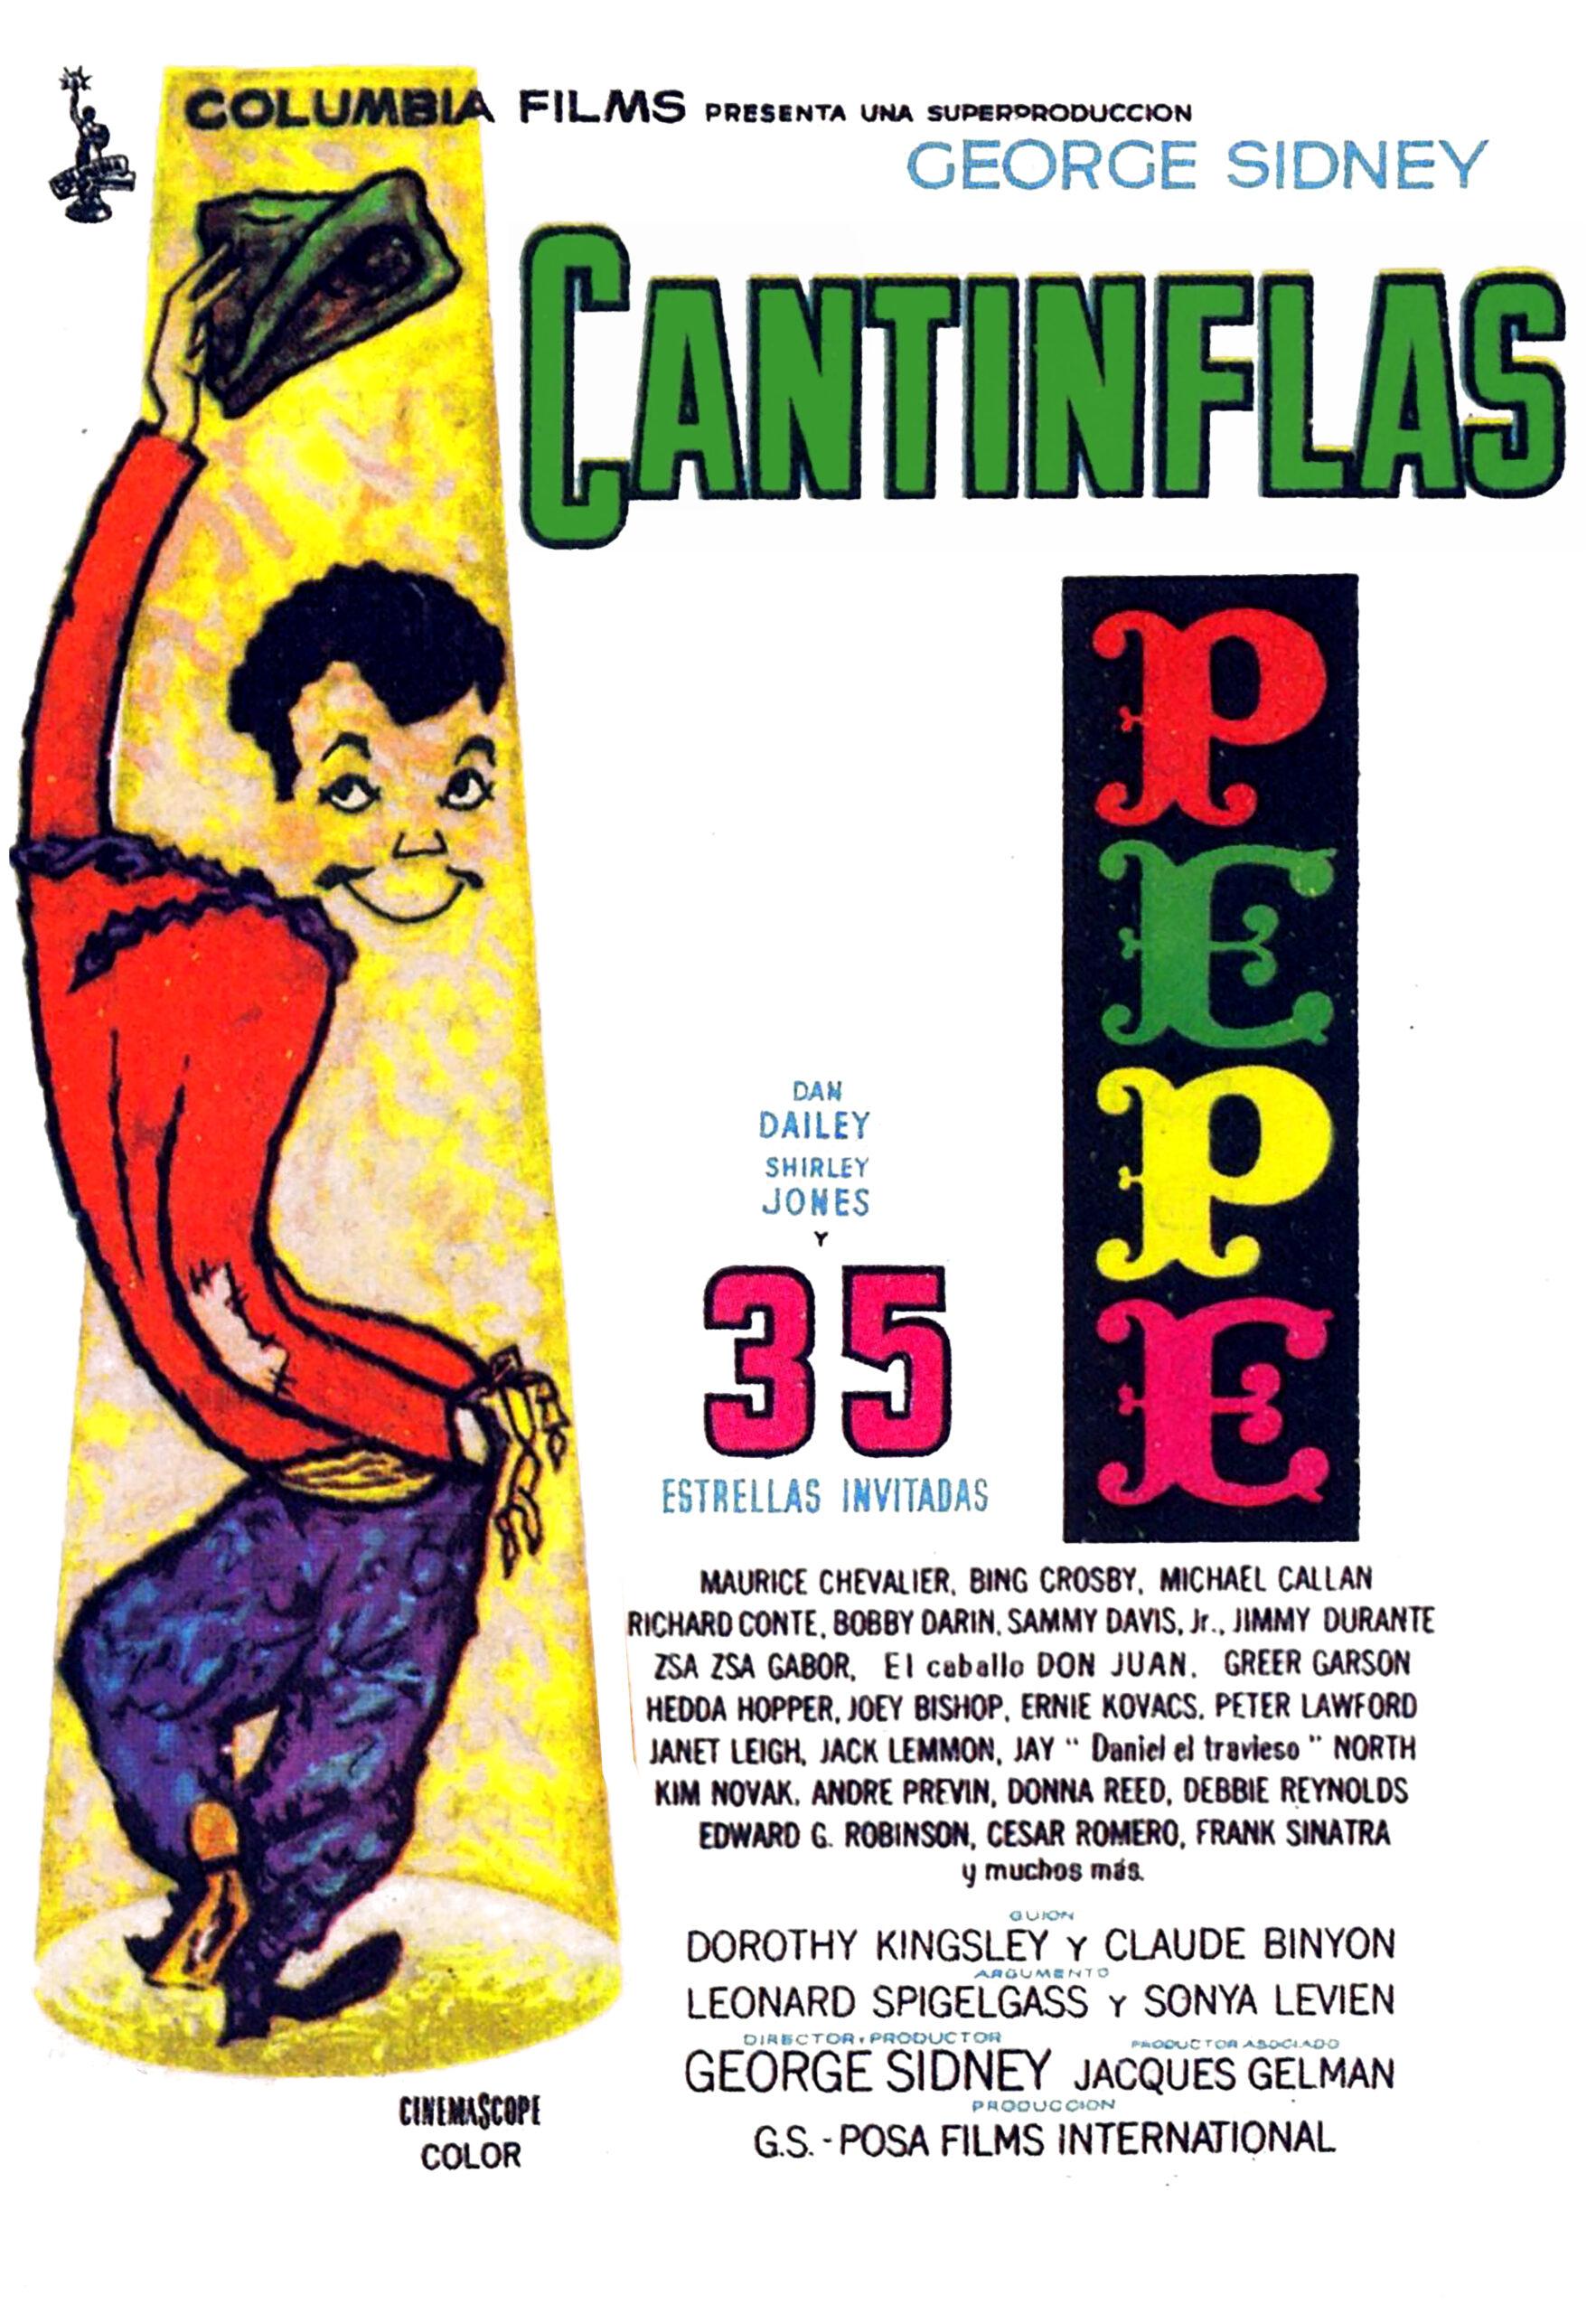 Cartel Pepe